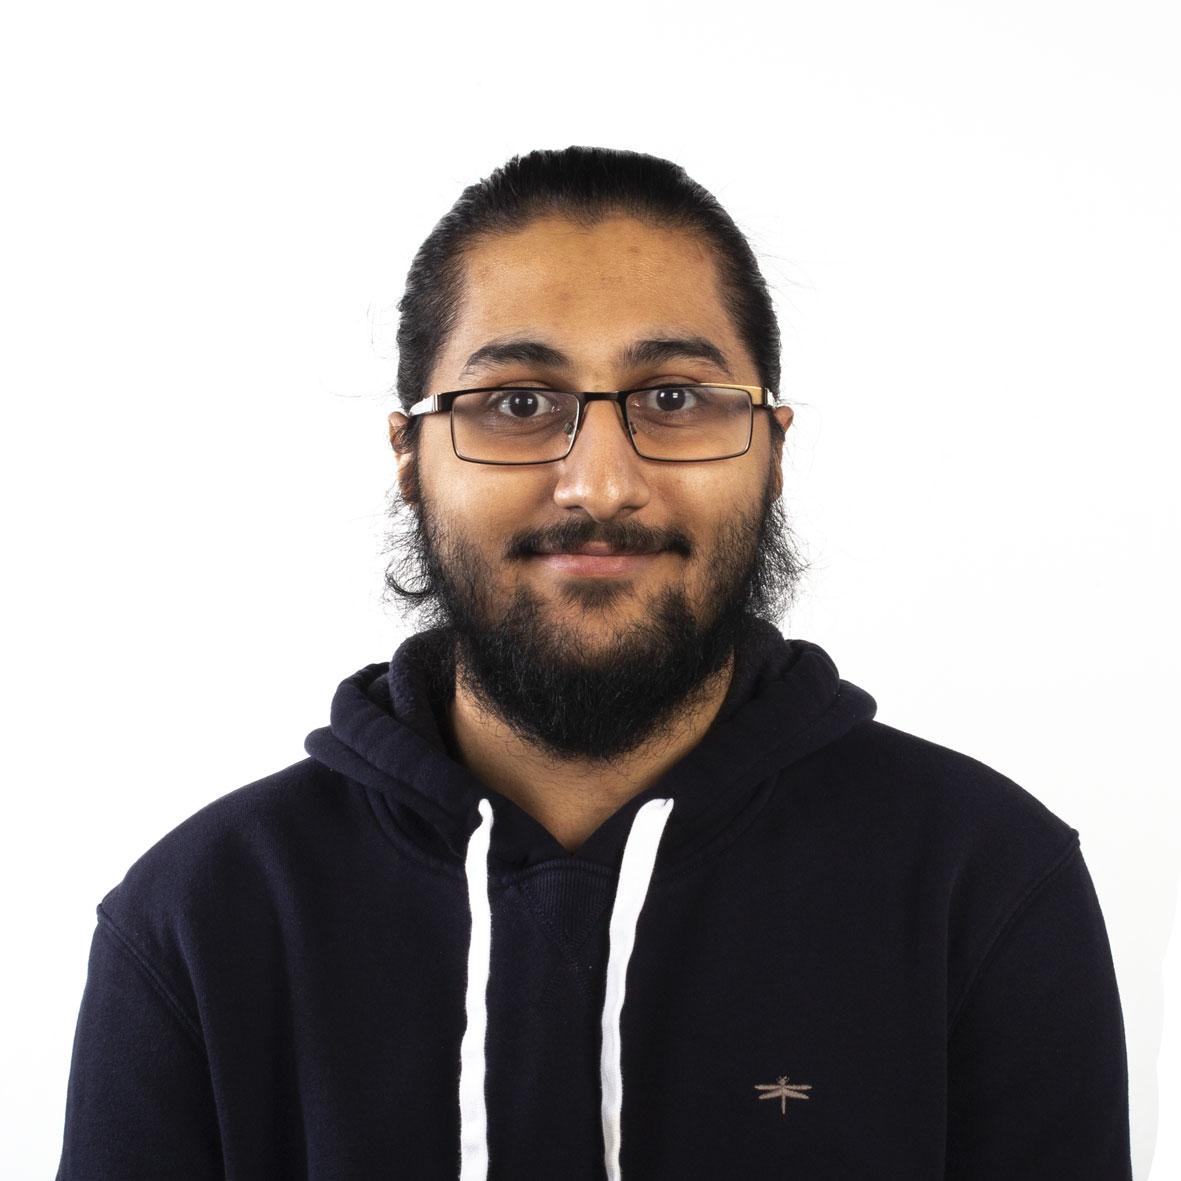 Rishiraj Sihra